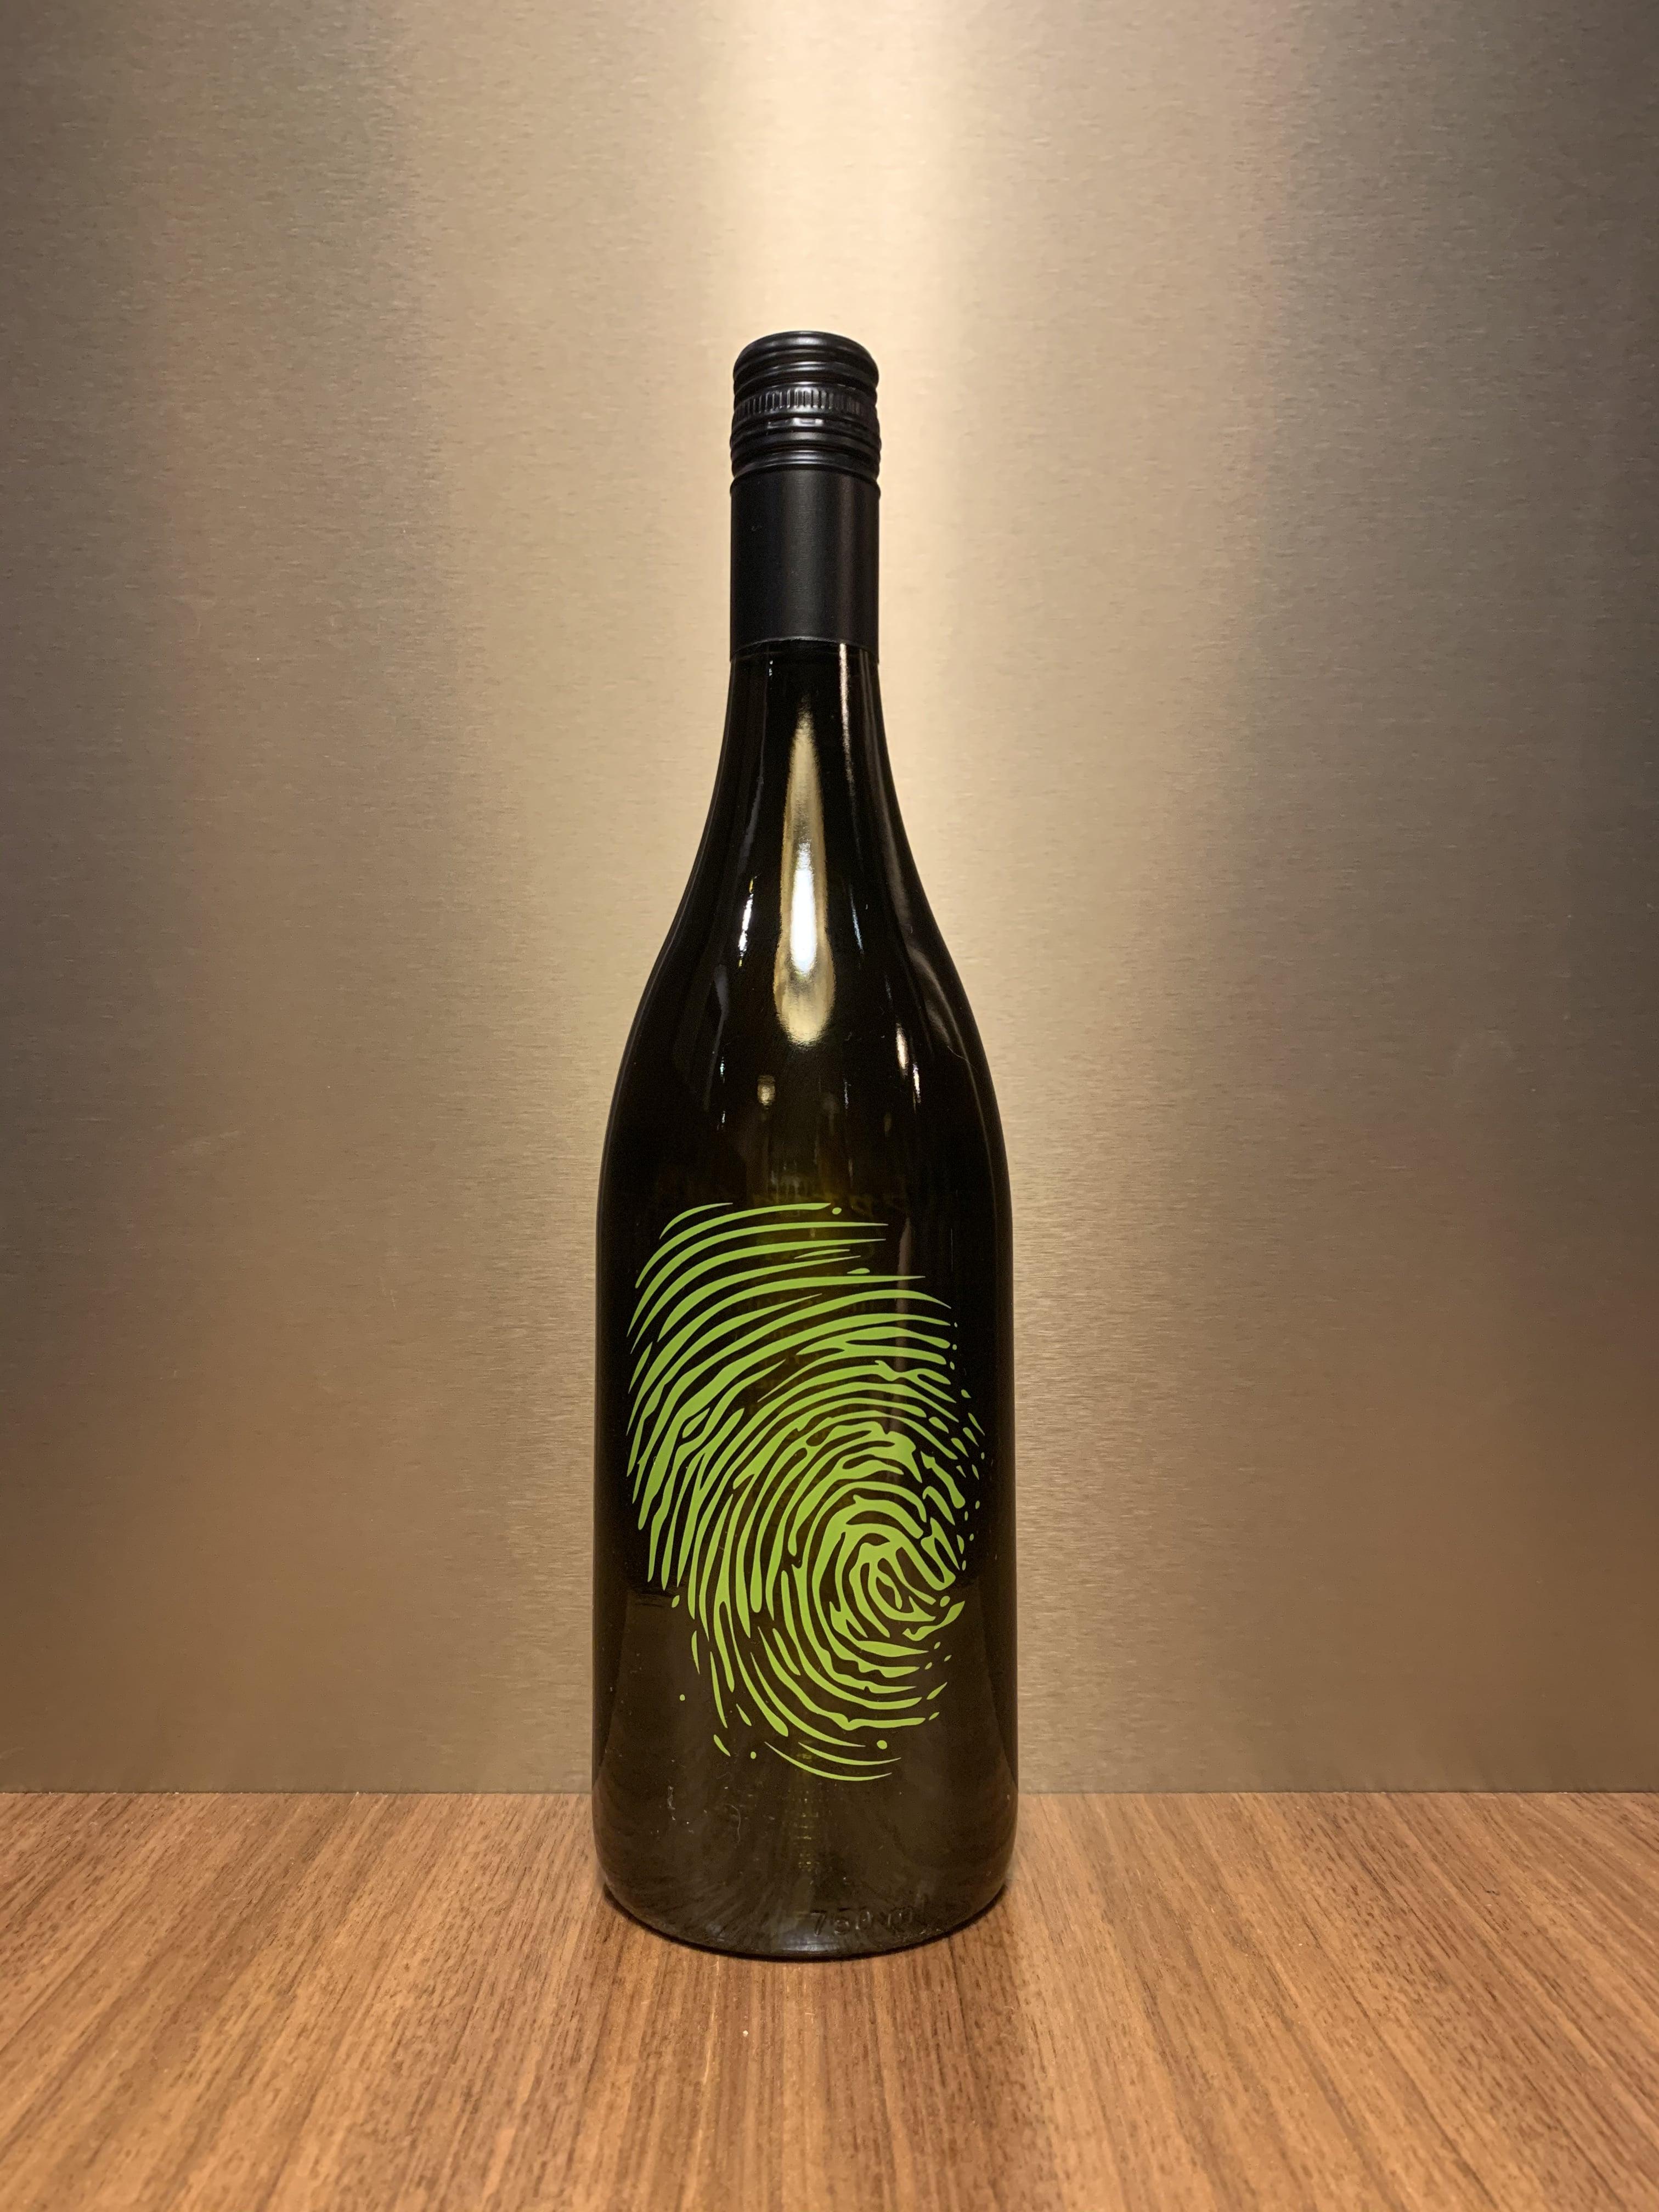 2017 Chardonnay - Ramiro Vineyard